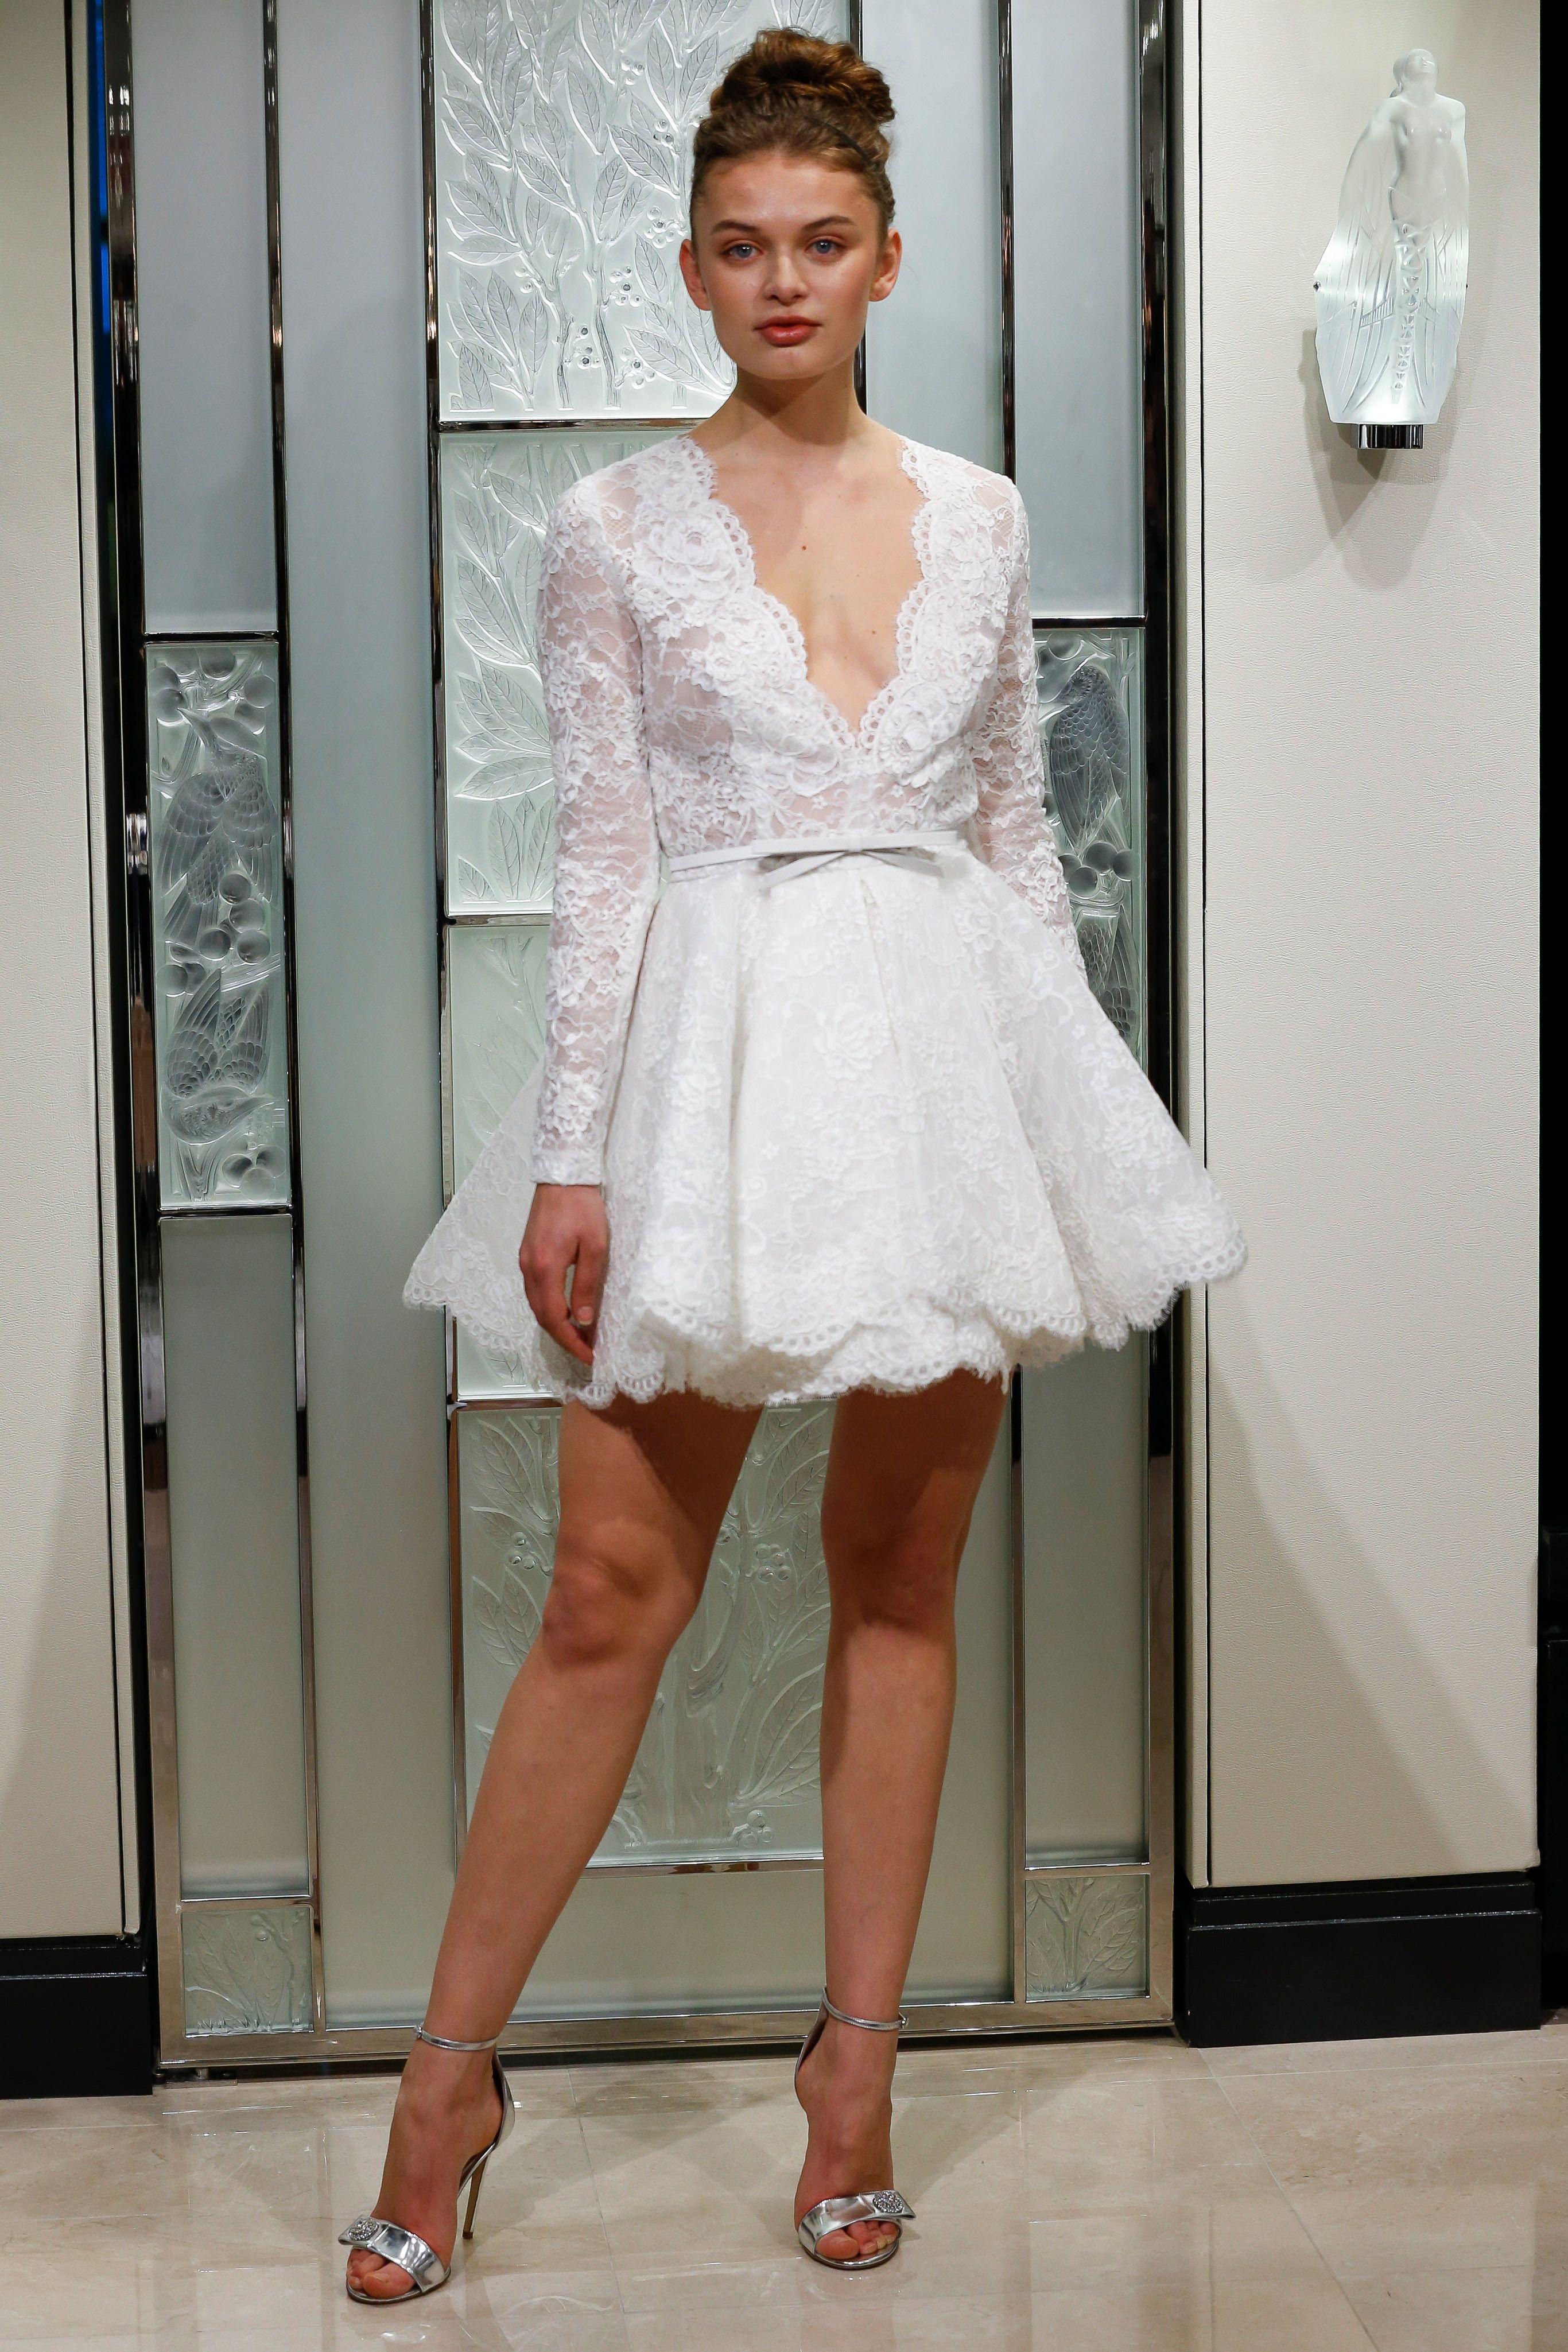 Chic Short Wedding Dresses Short Wedding Dress Dresses Wedding Dress Trends [ 4098 x 2732 Pixel ]